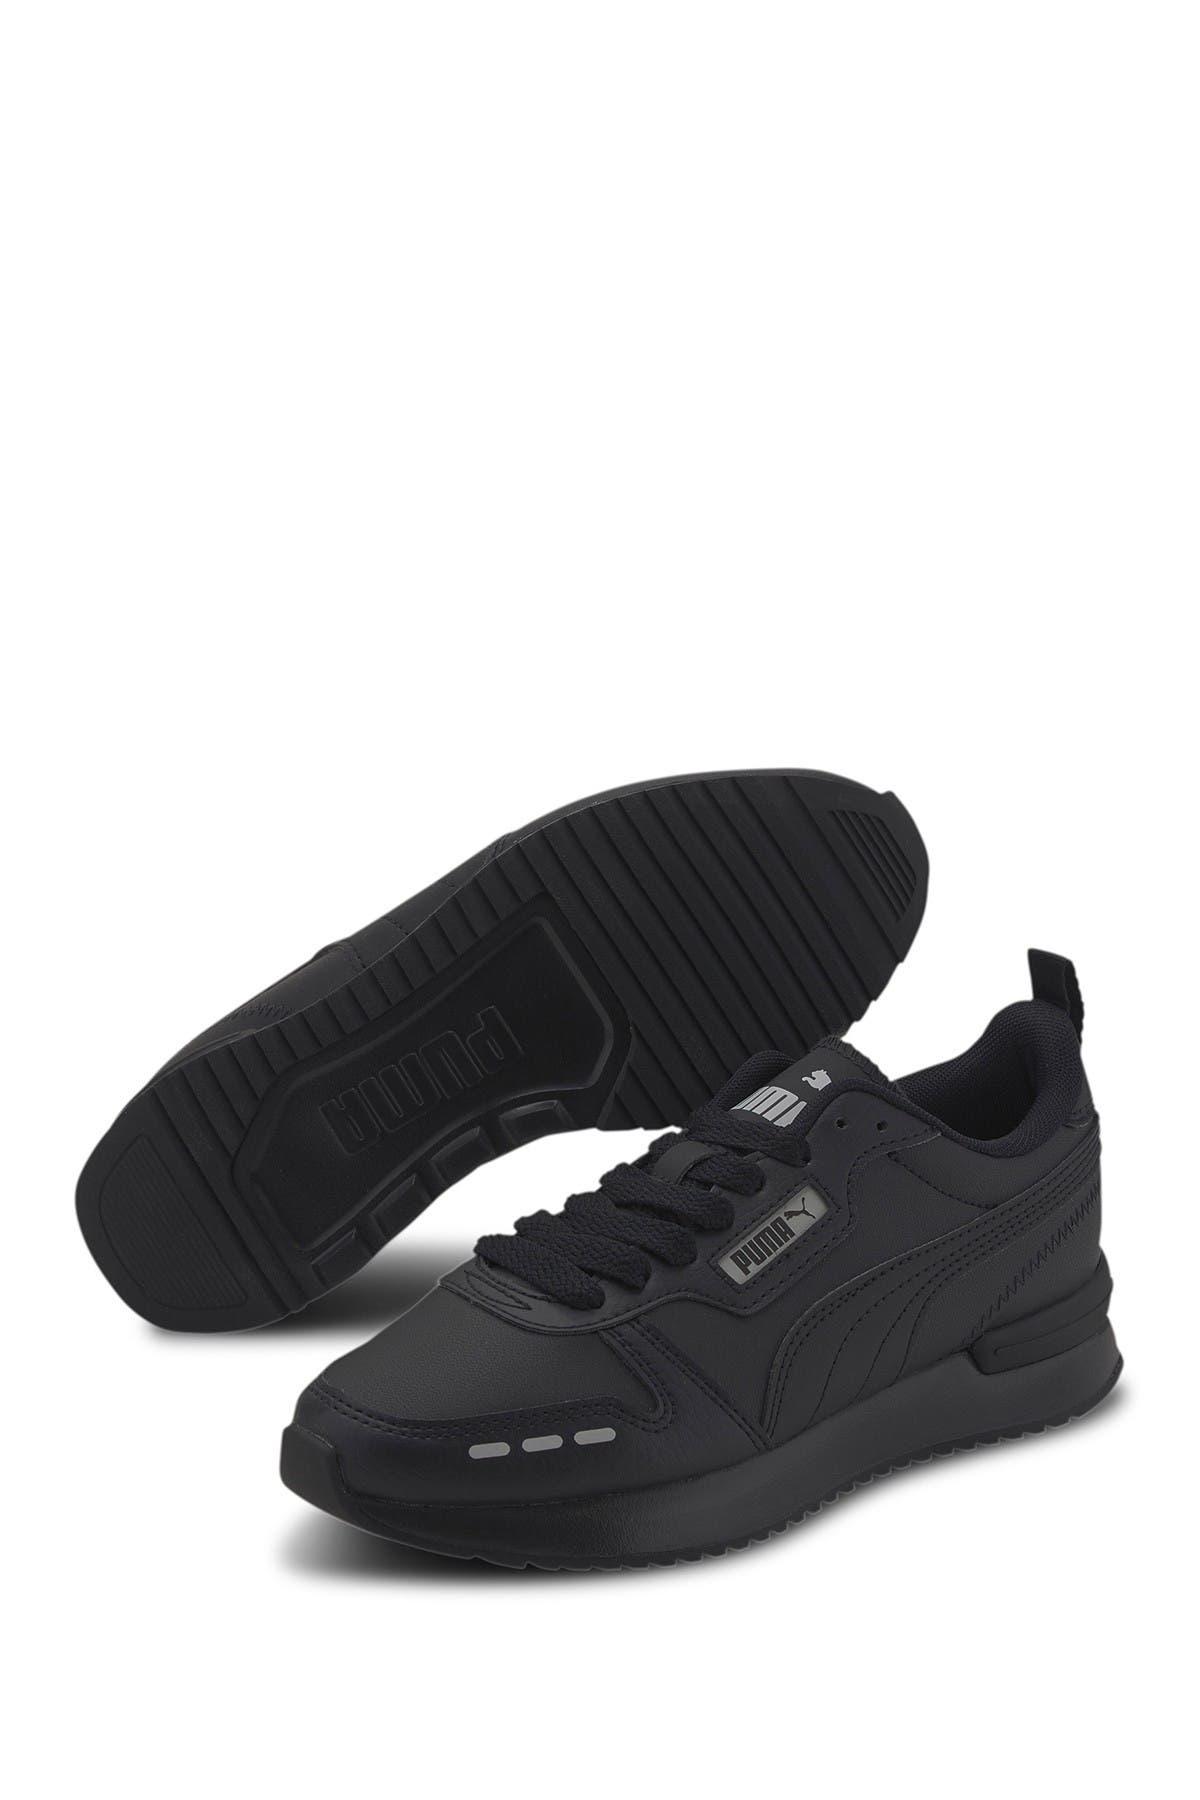 Image of PUMA R78 Sl Jr Sneaker